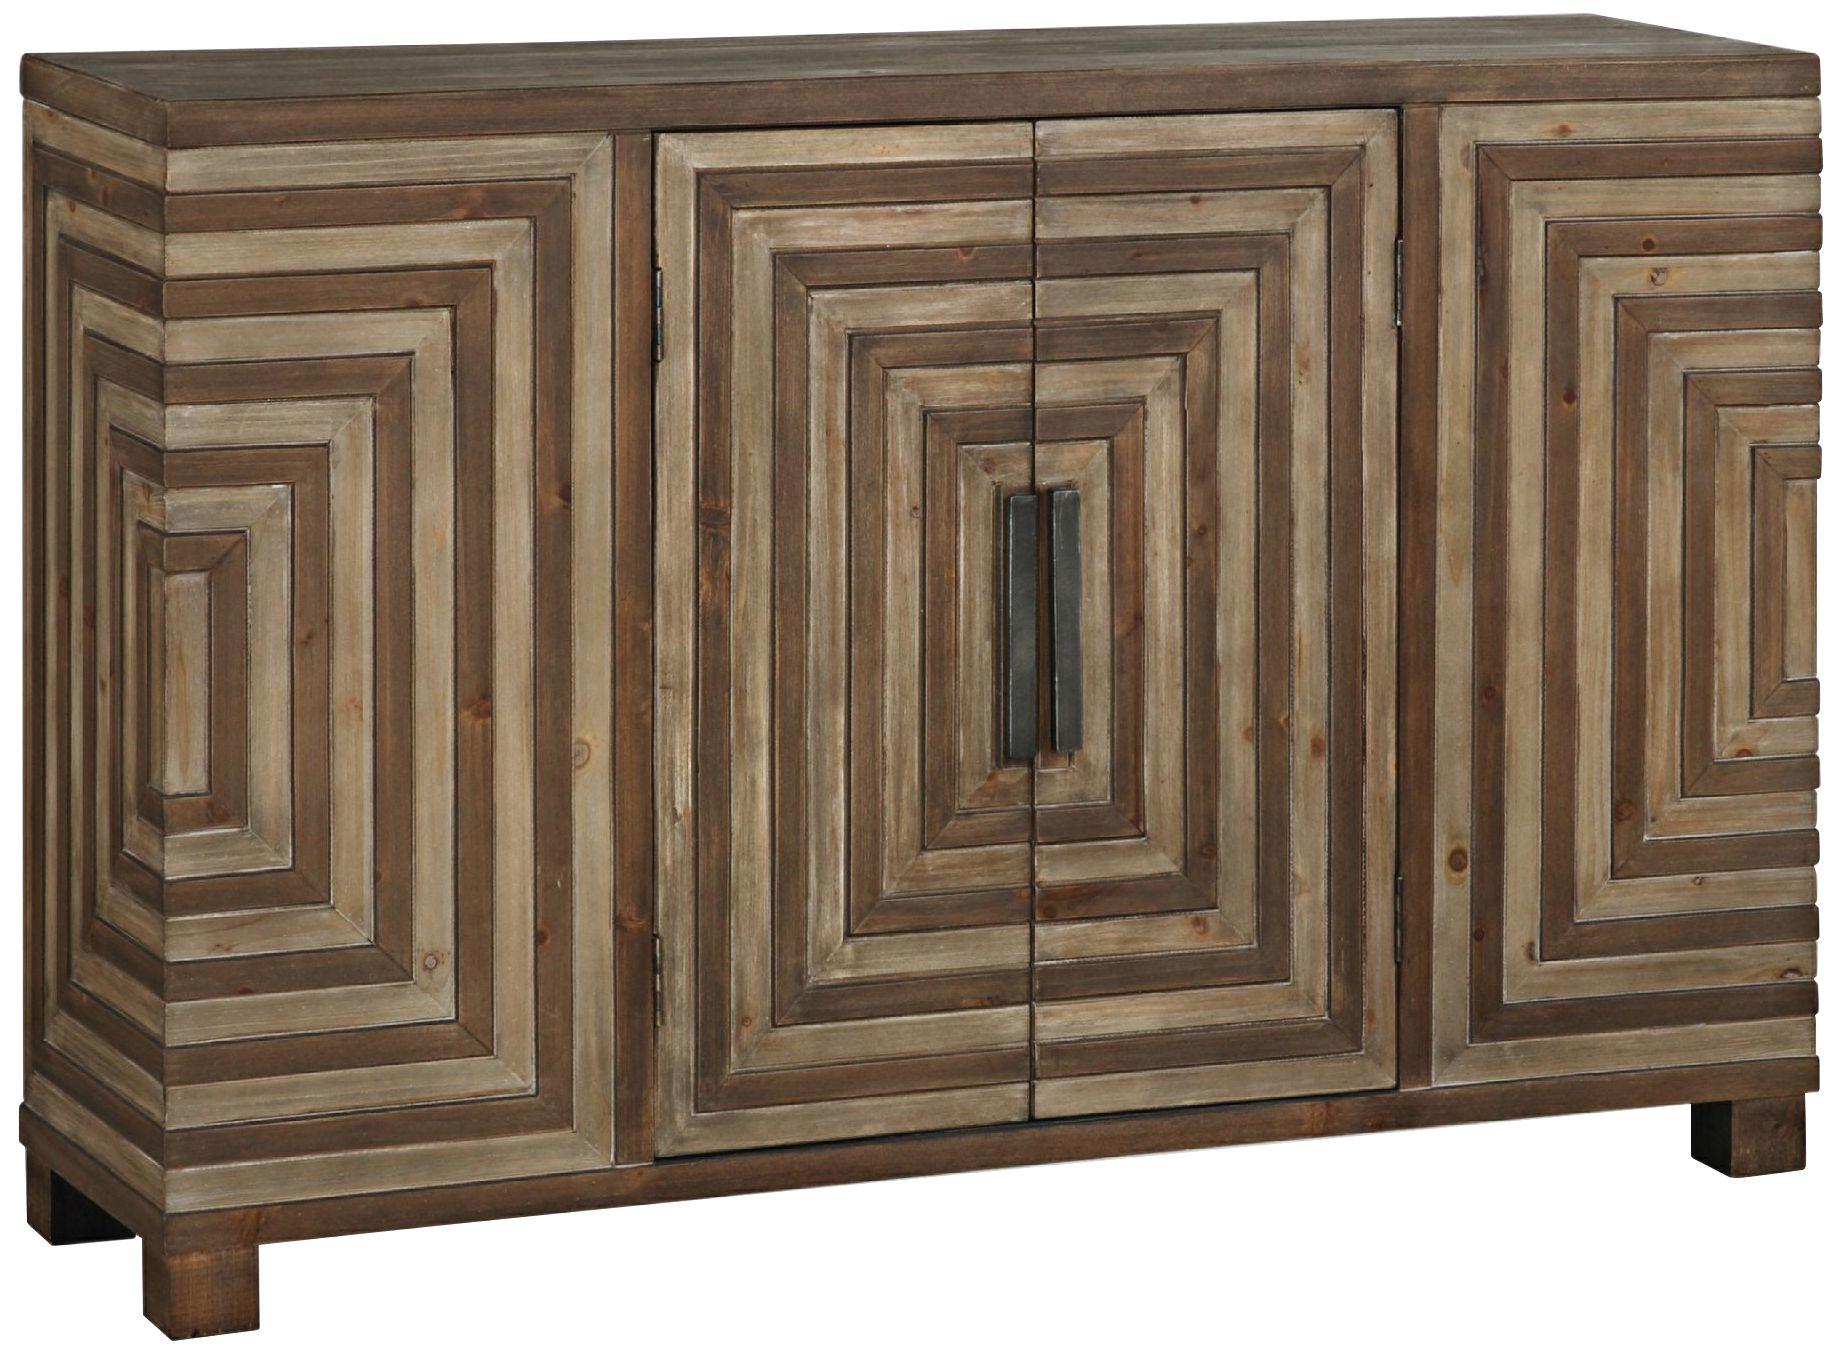 Uttermost Layton Rustic 2 Door Wood Console Cabinet